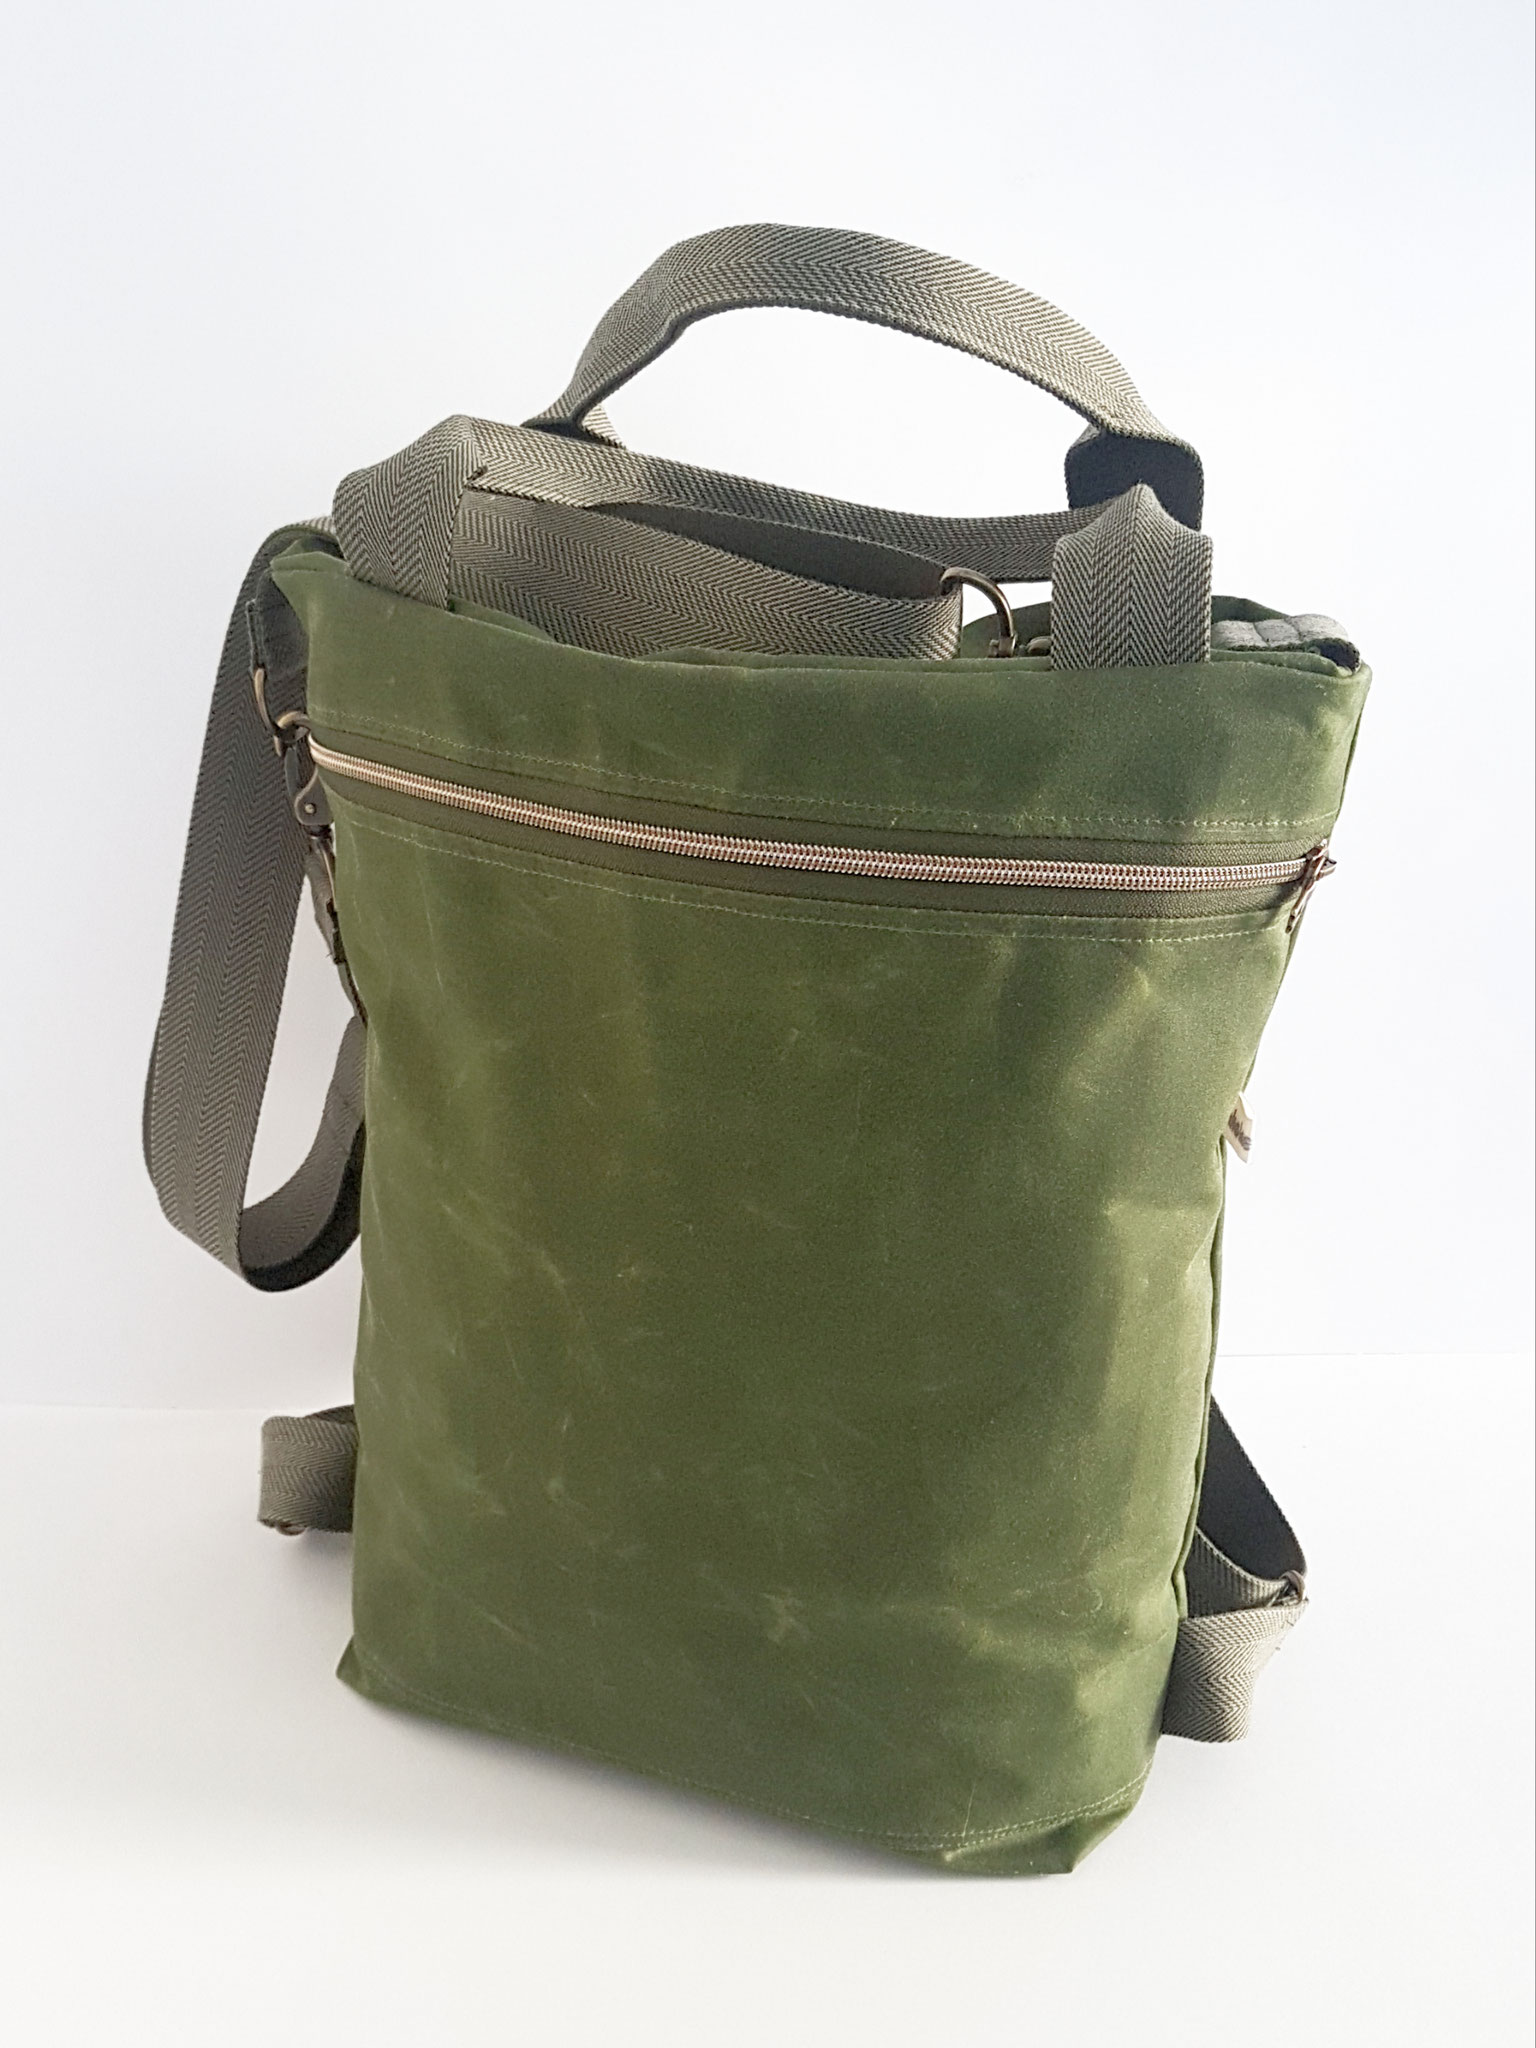 3in1 Bag Oilskin farn, verkauft